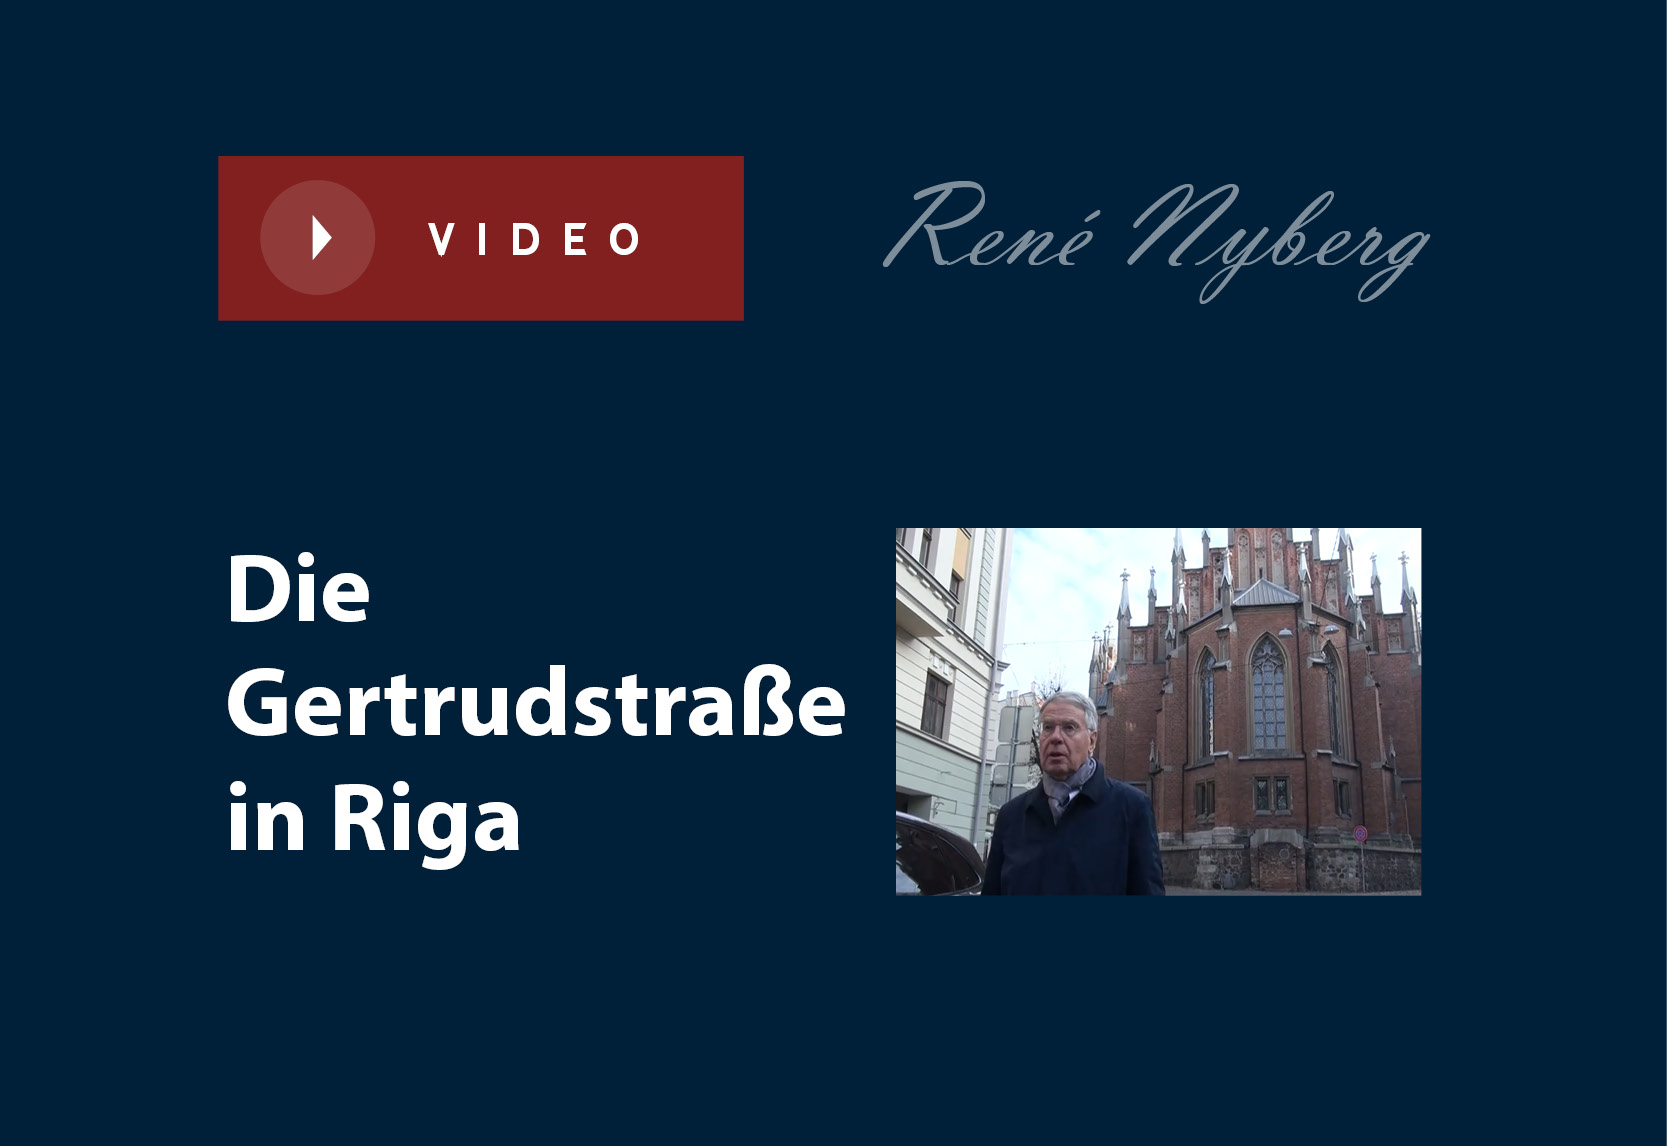 Die Gertrudstraße in Riga